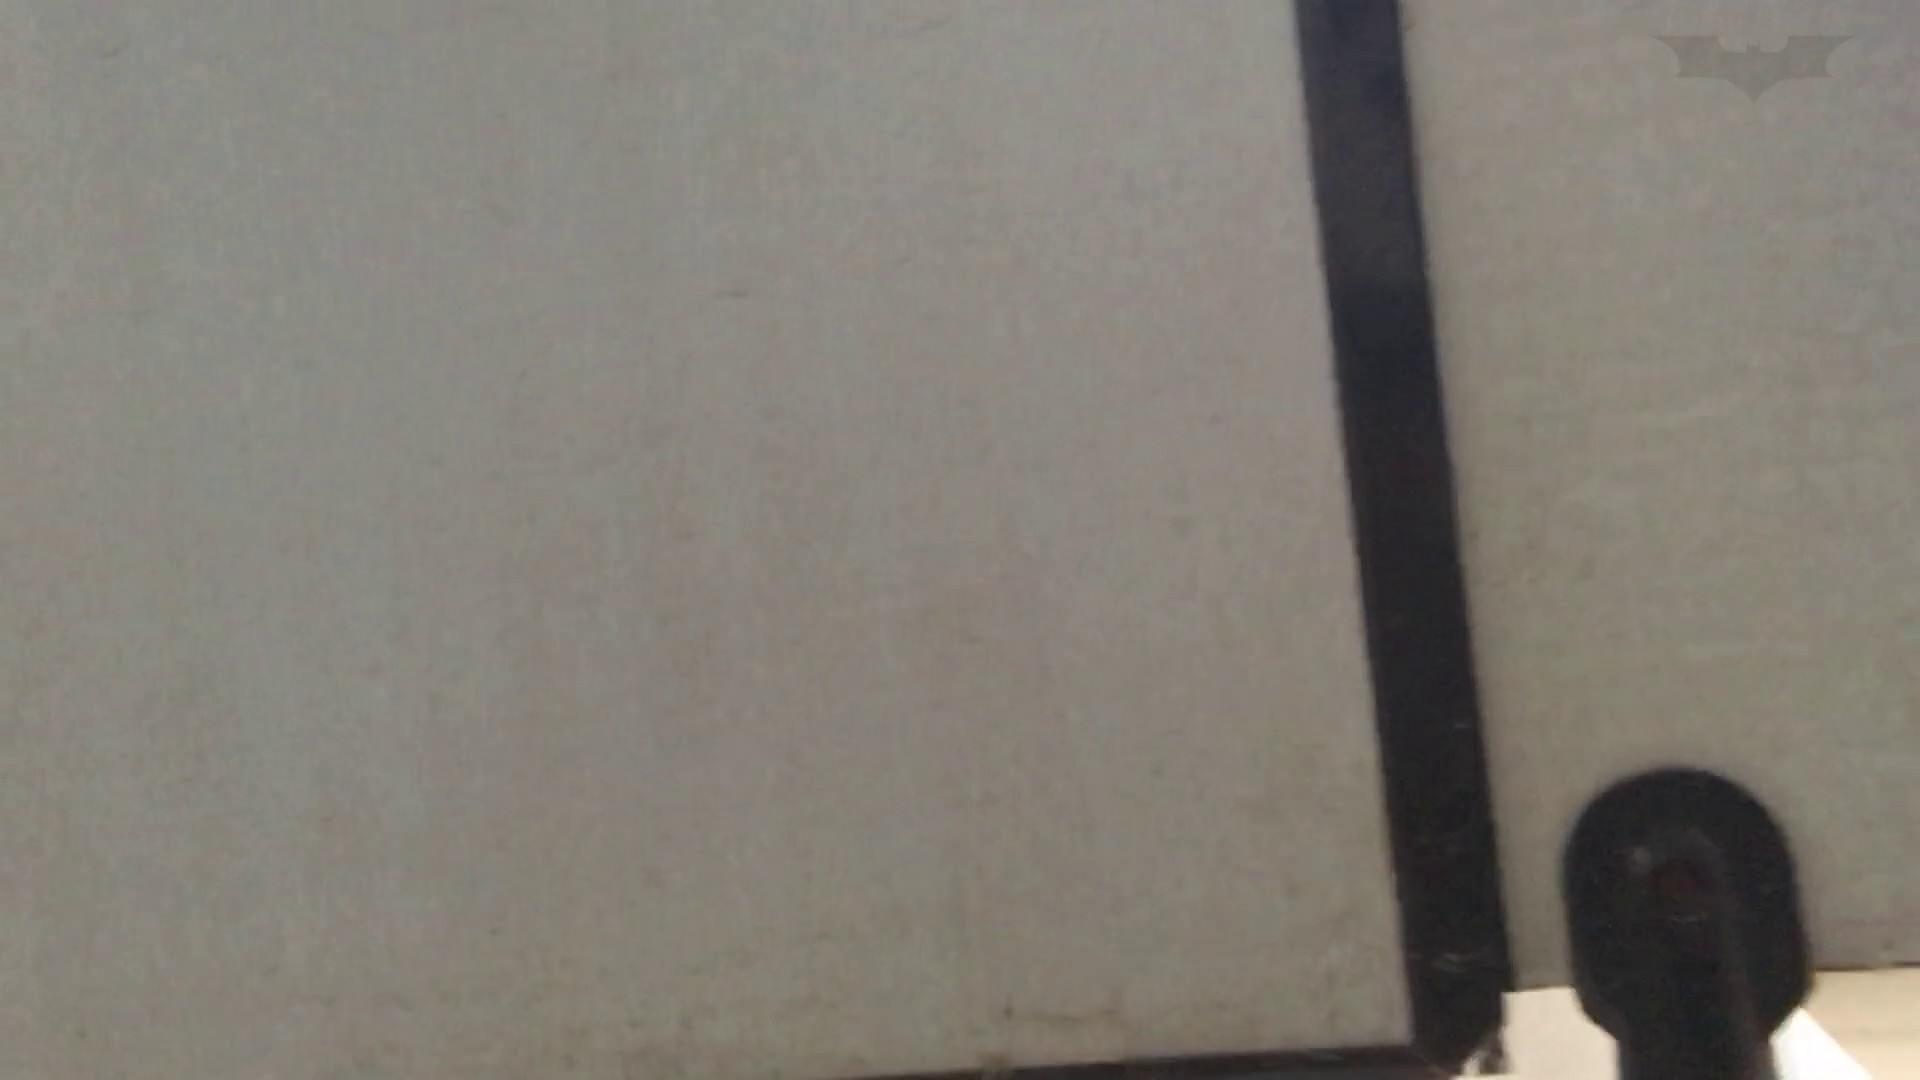 芸術大学ガチ潜入盗撮 JD盗撮 美女の洗面所の秘密 Vol.80 盛合せ  79PIX 75